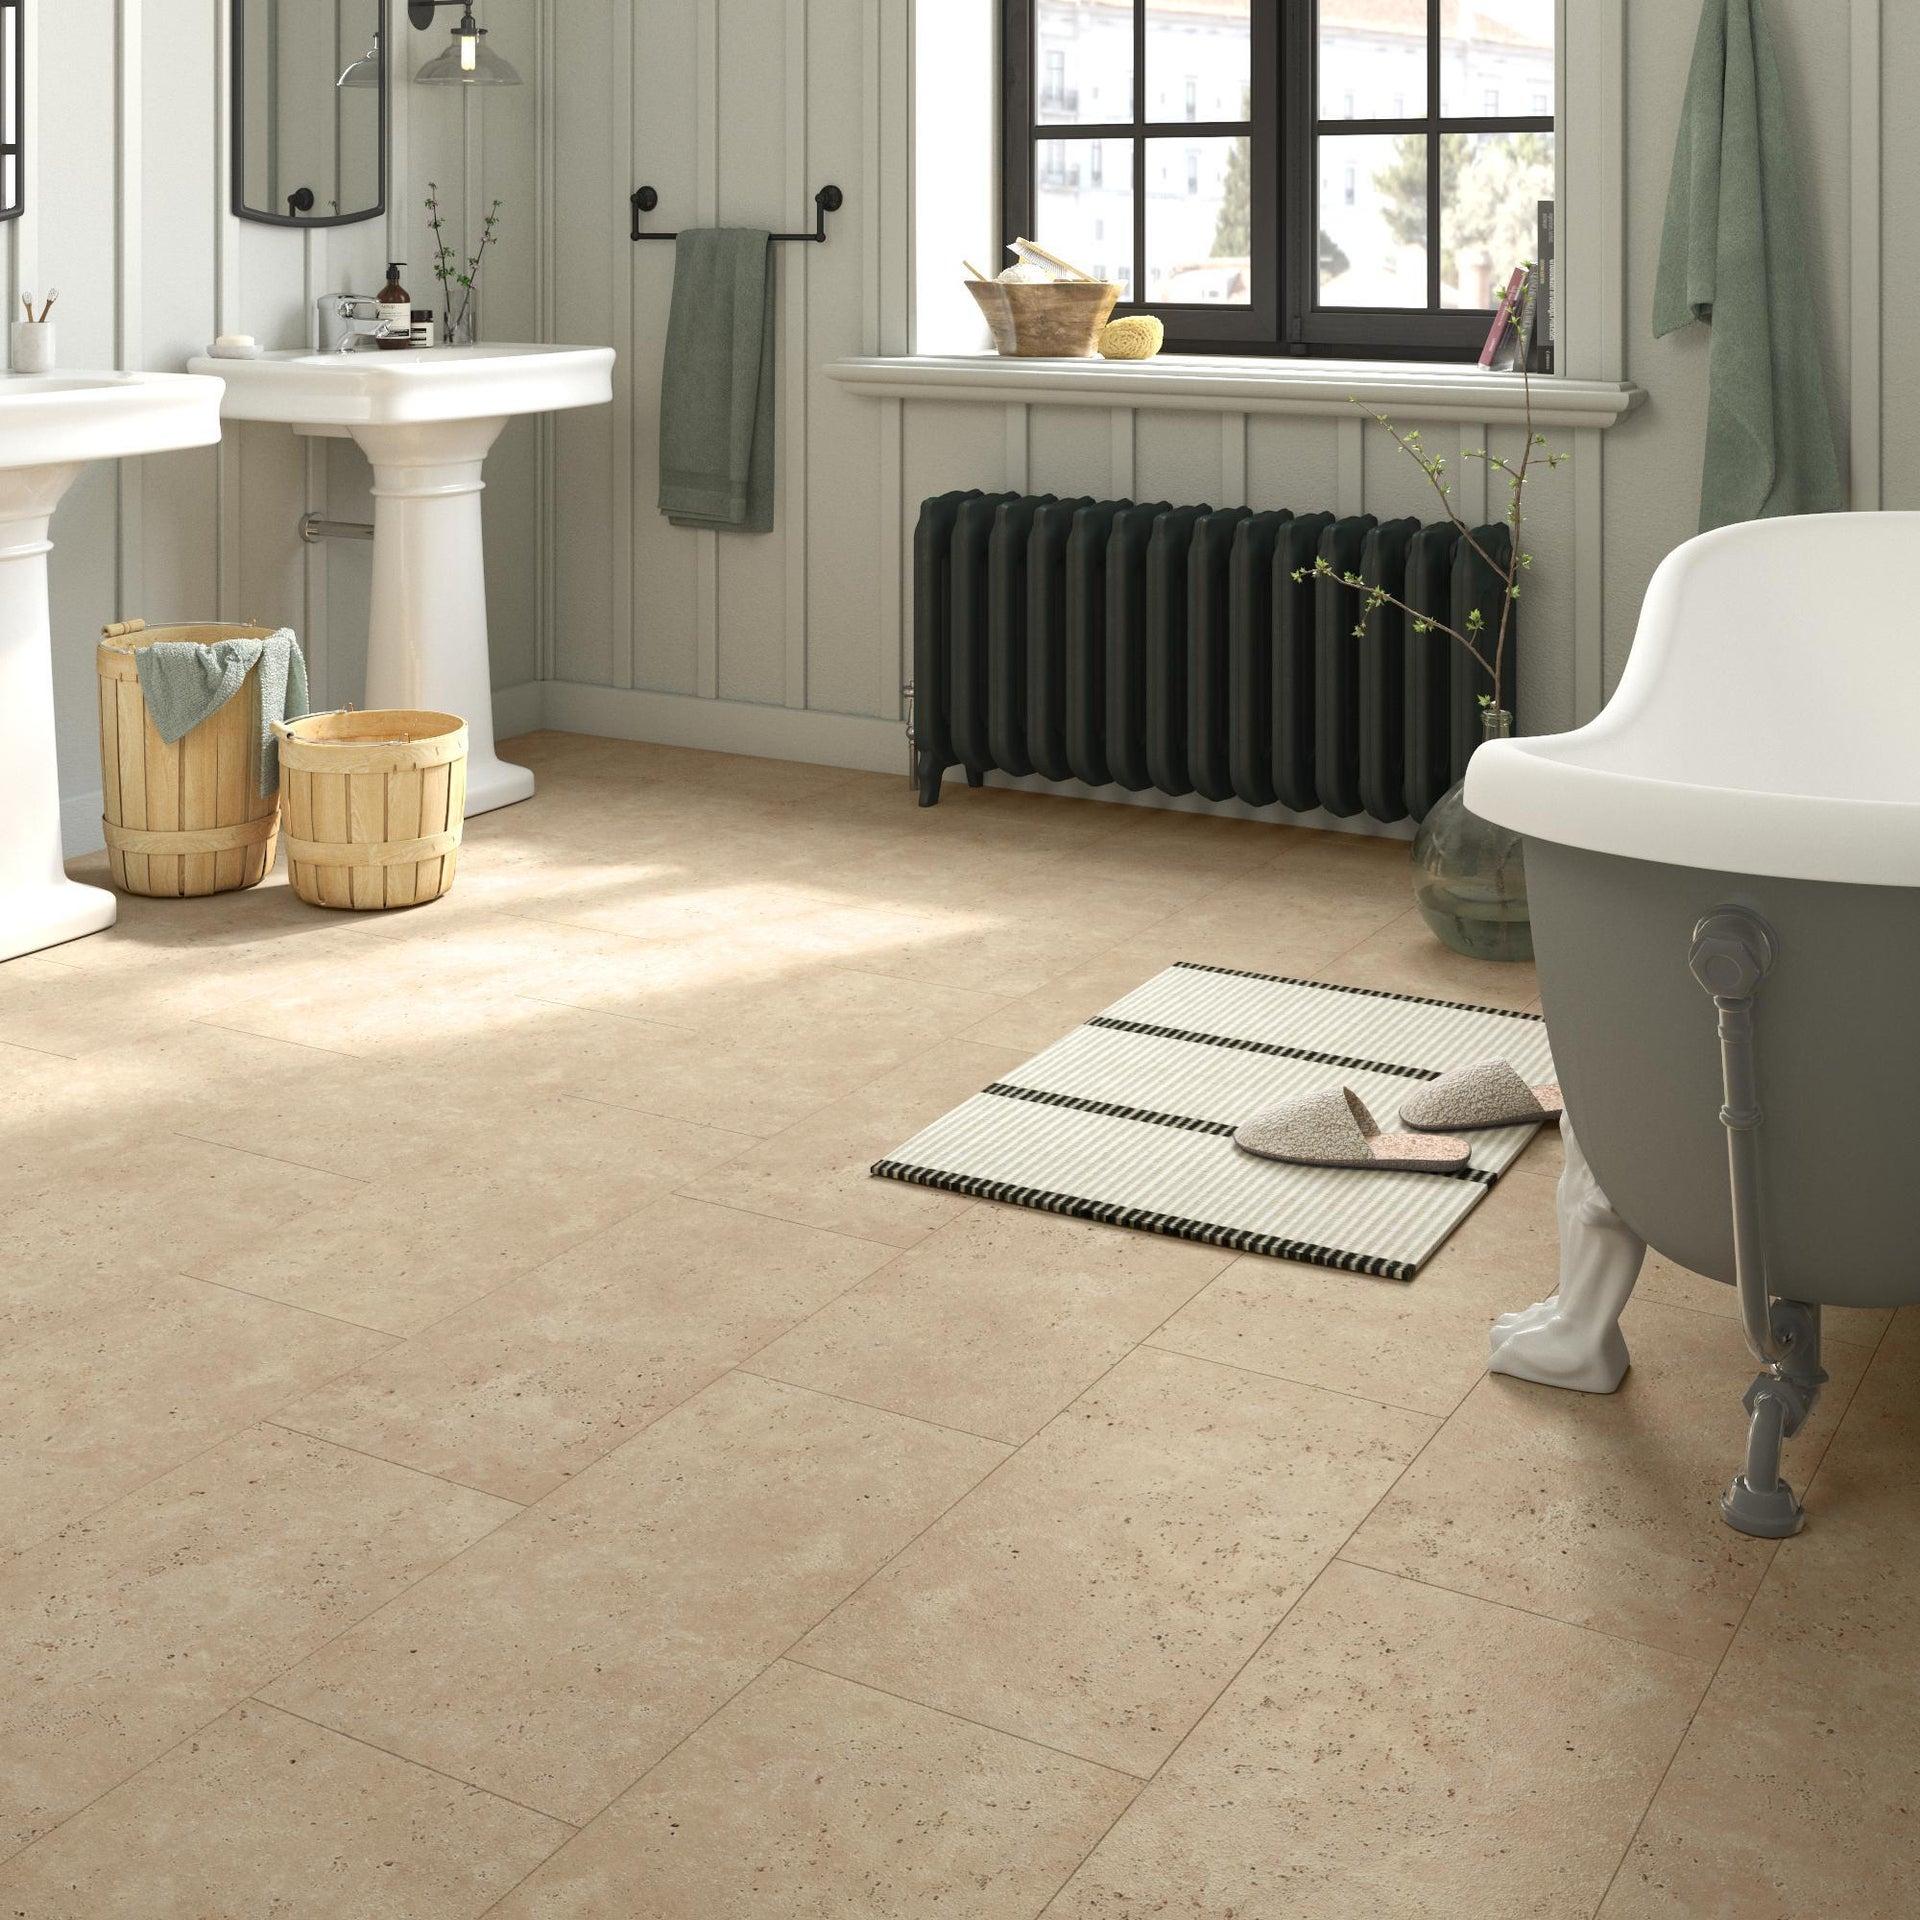 Pavimento PVC adesivo Travertino Sp 1.5 mm beige - 4